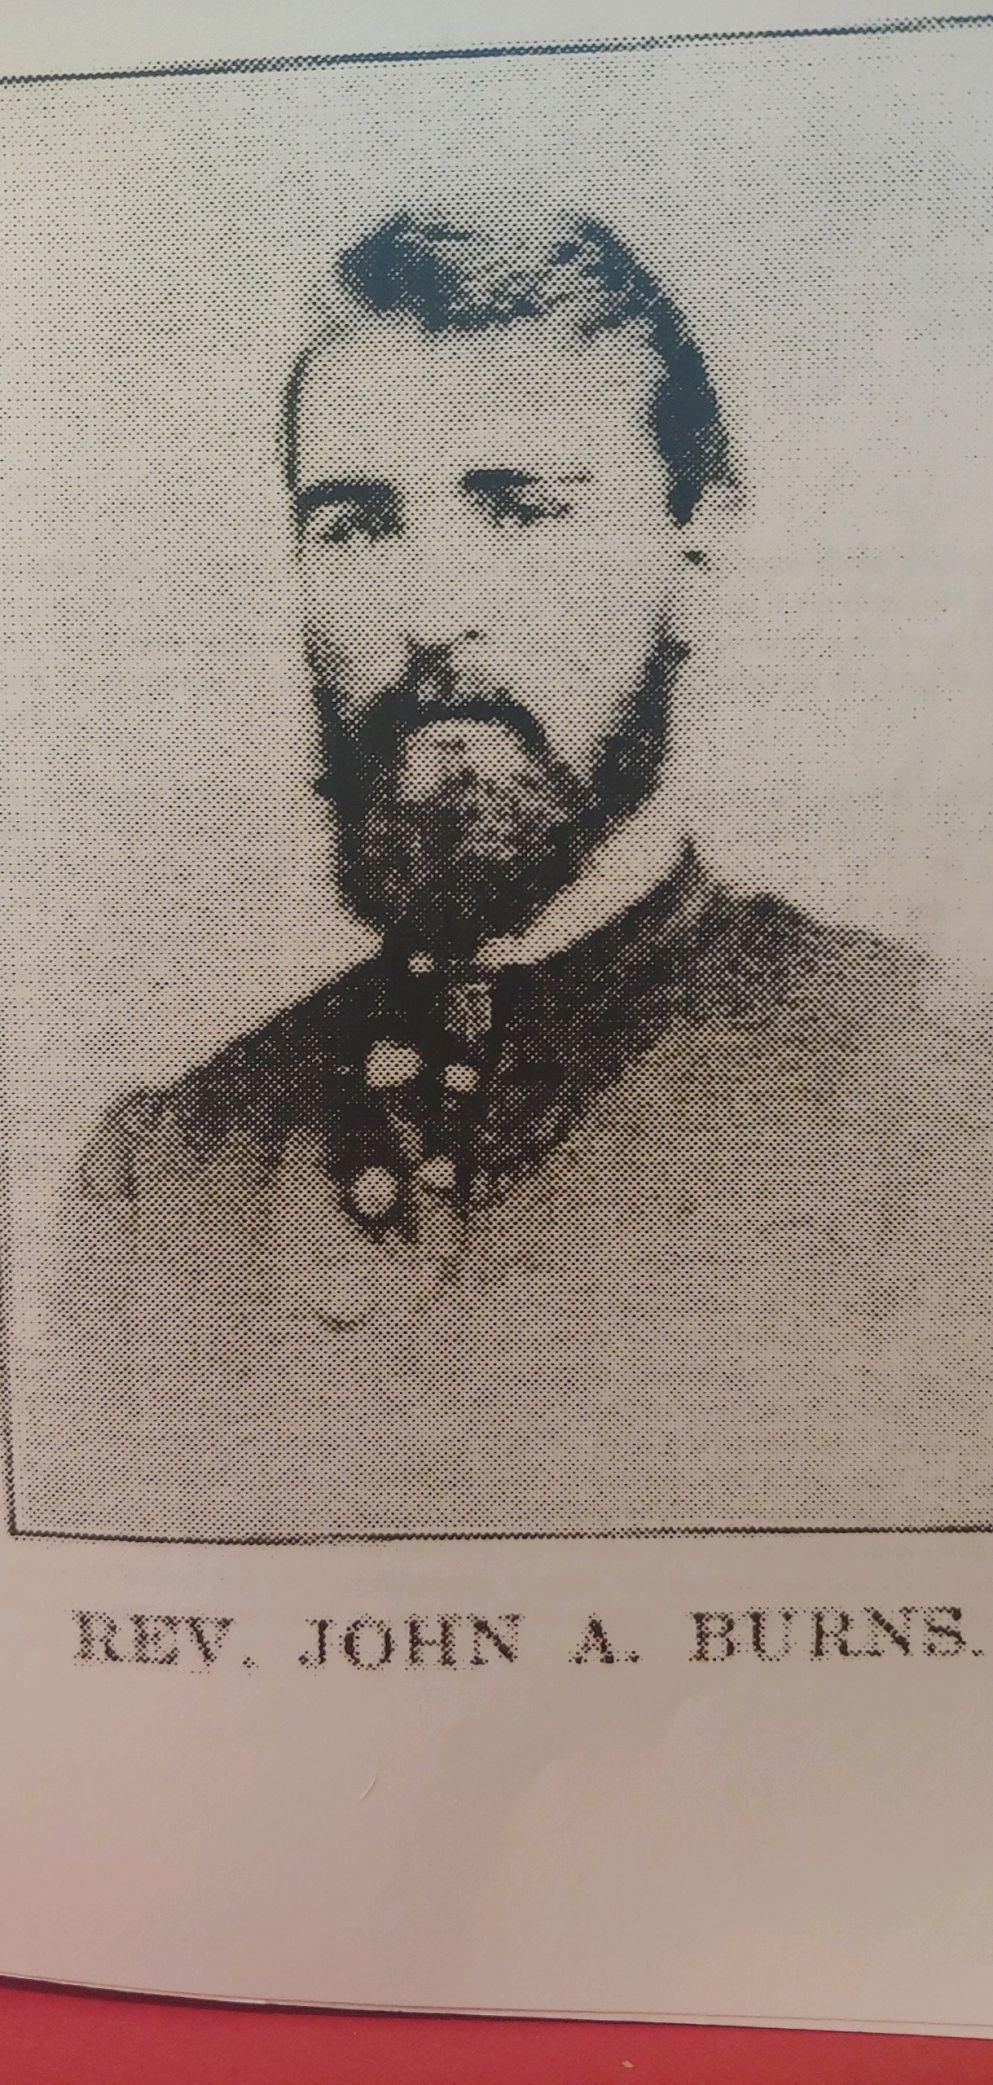 The Rev. John A. Burns